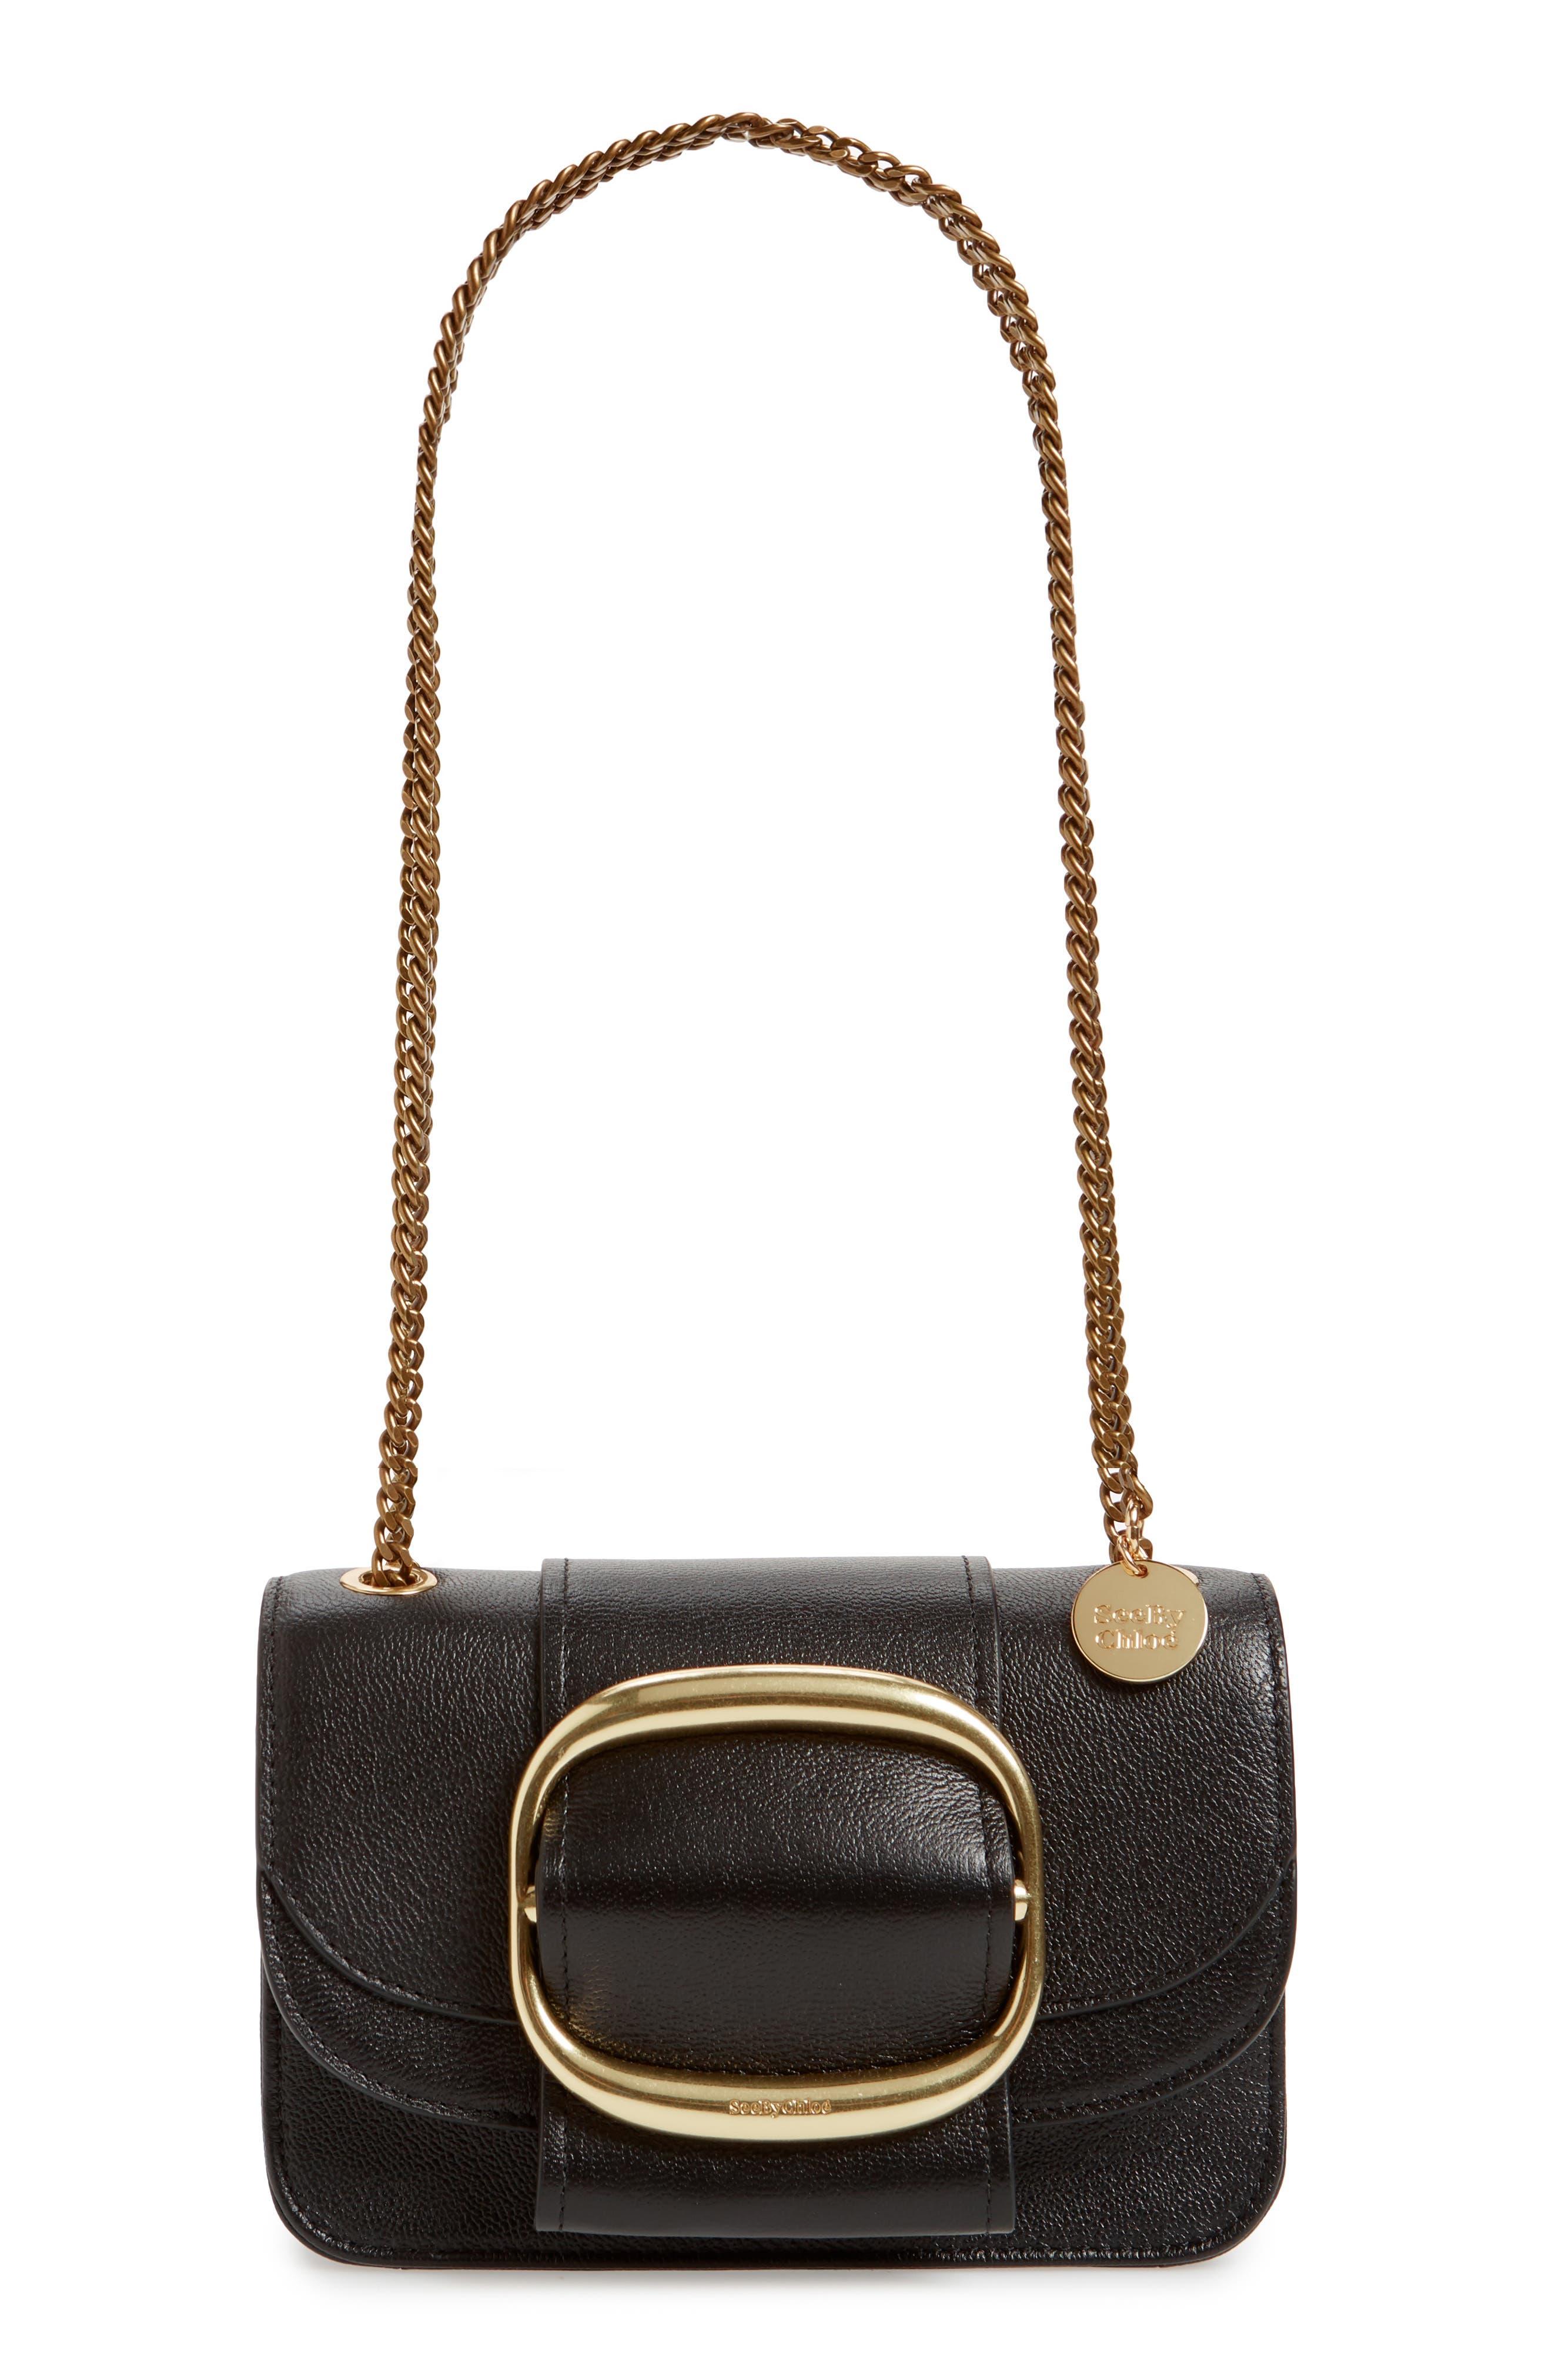 SEE BY CHLOÉ, Hopper Leather Shoulder Bag, Main thumbnail 1, color, 001